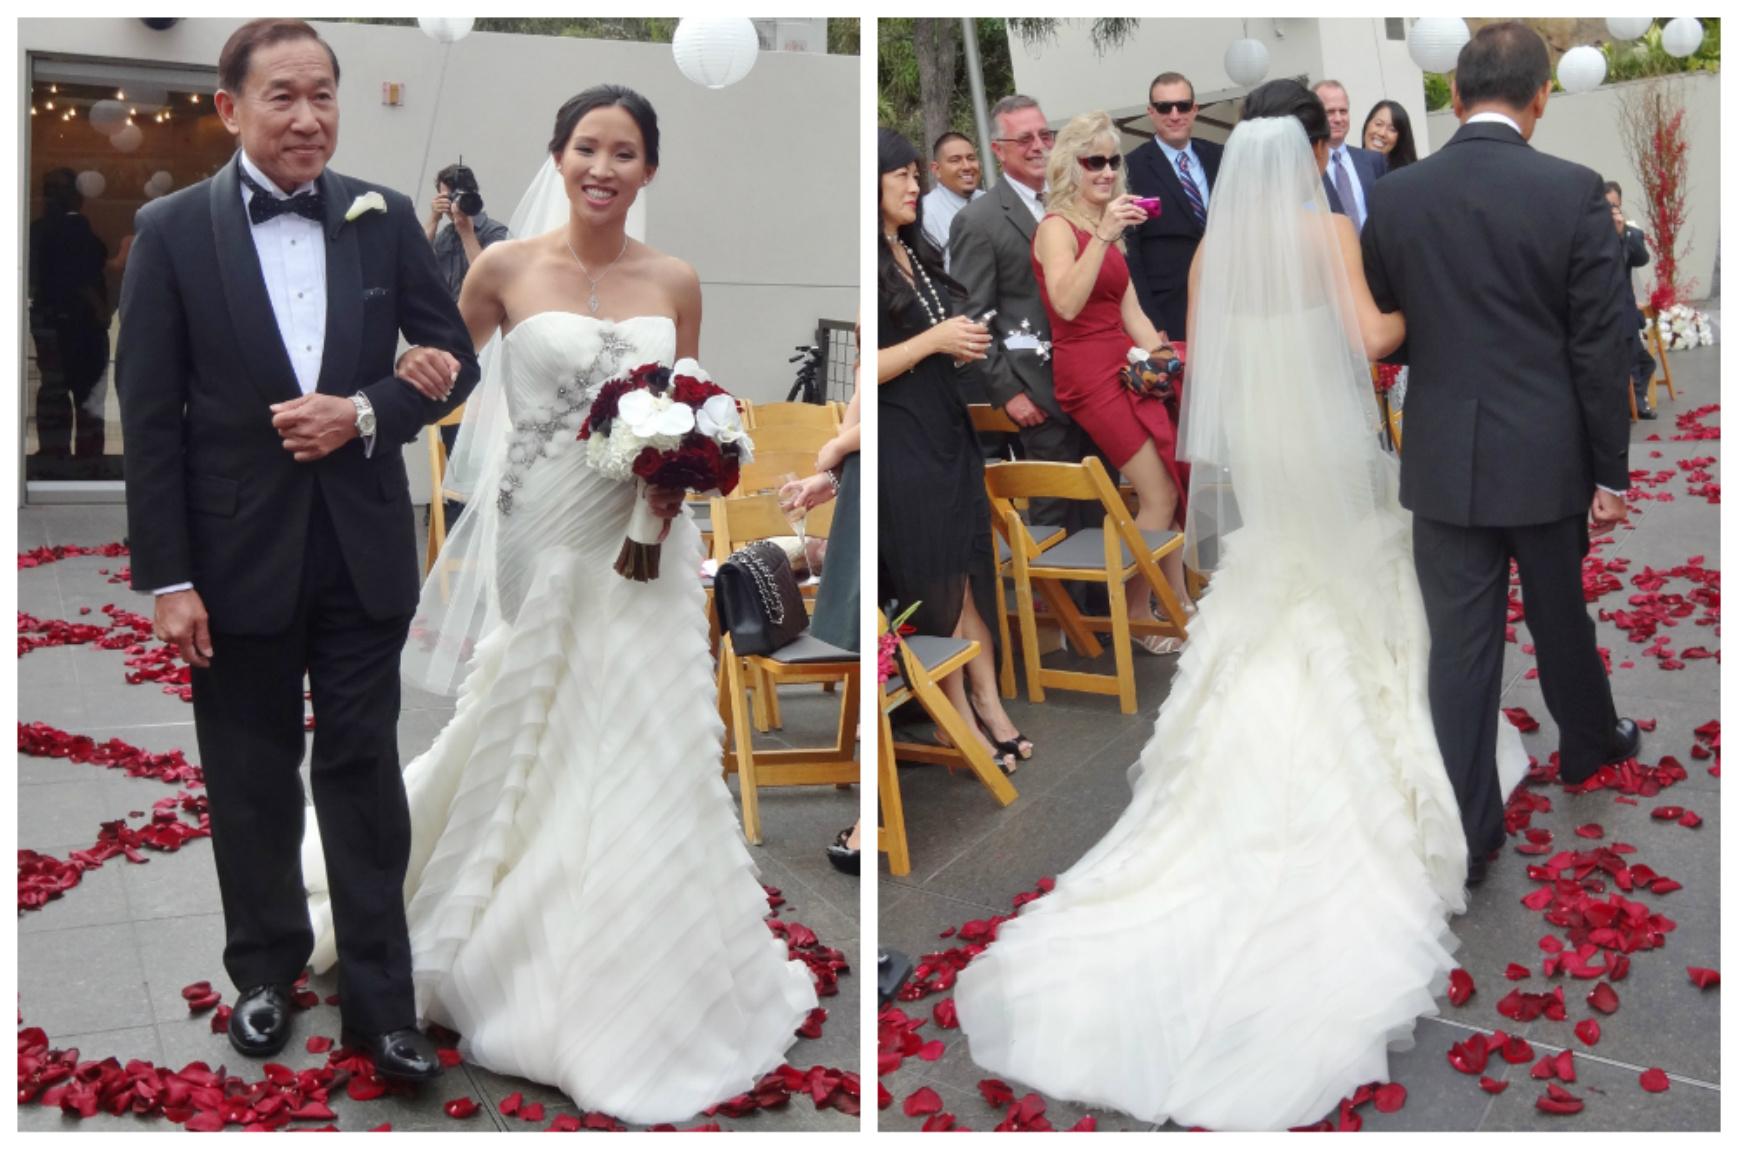 Pauls Wedding Photo 3